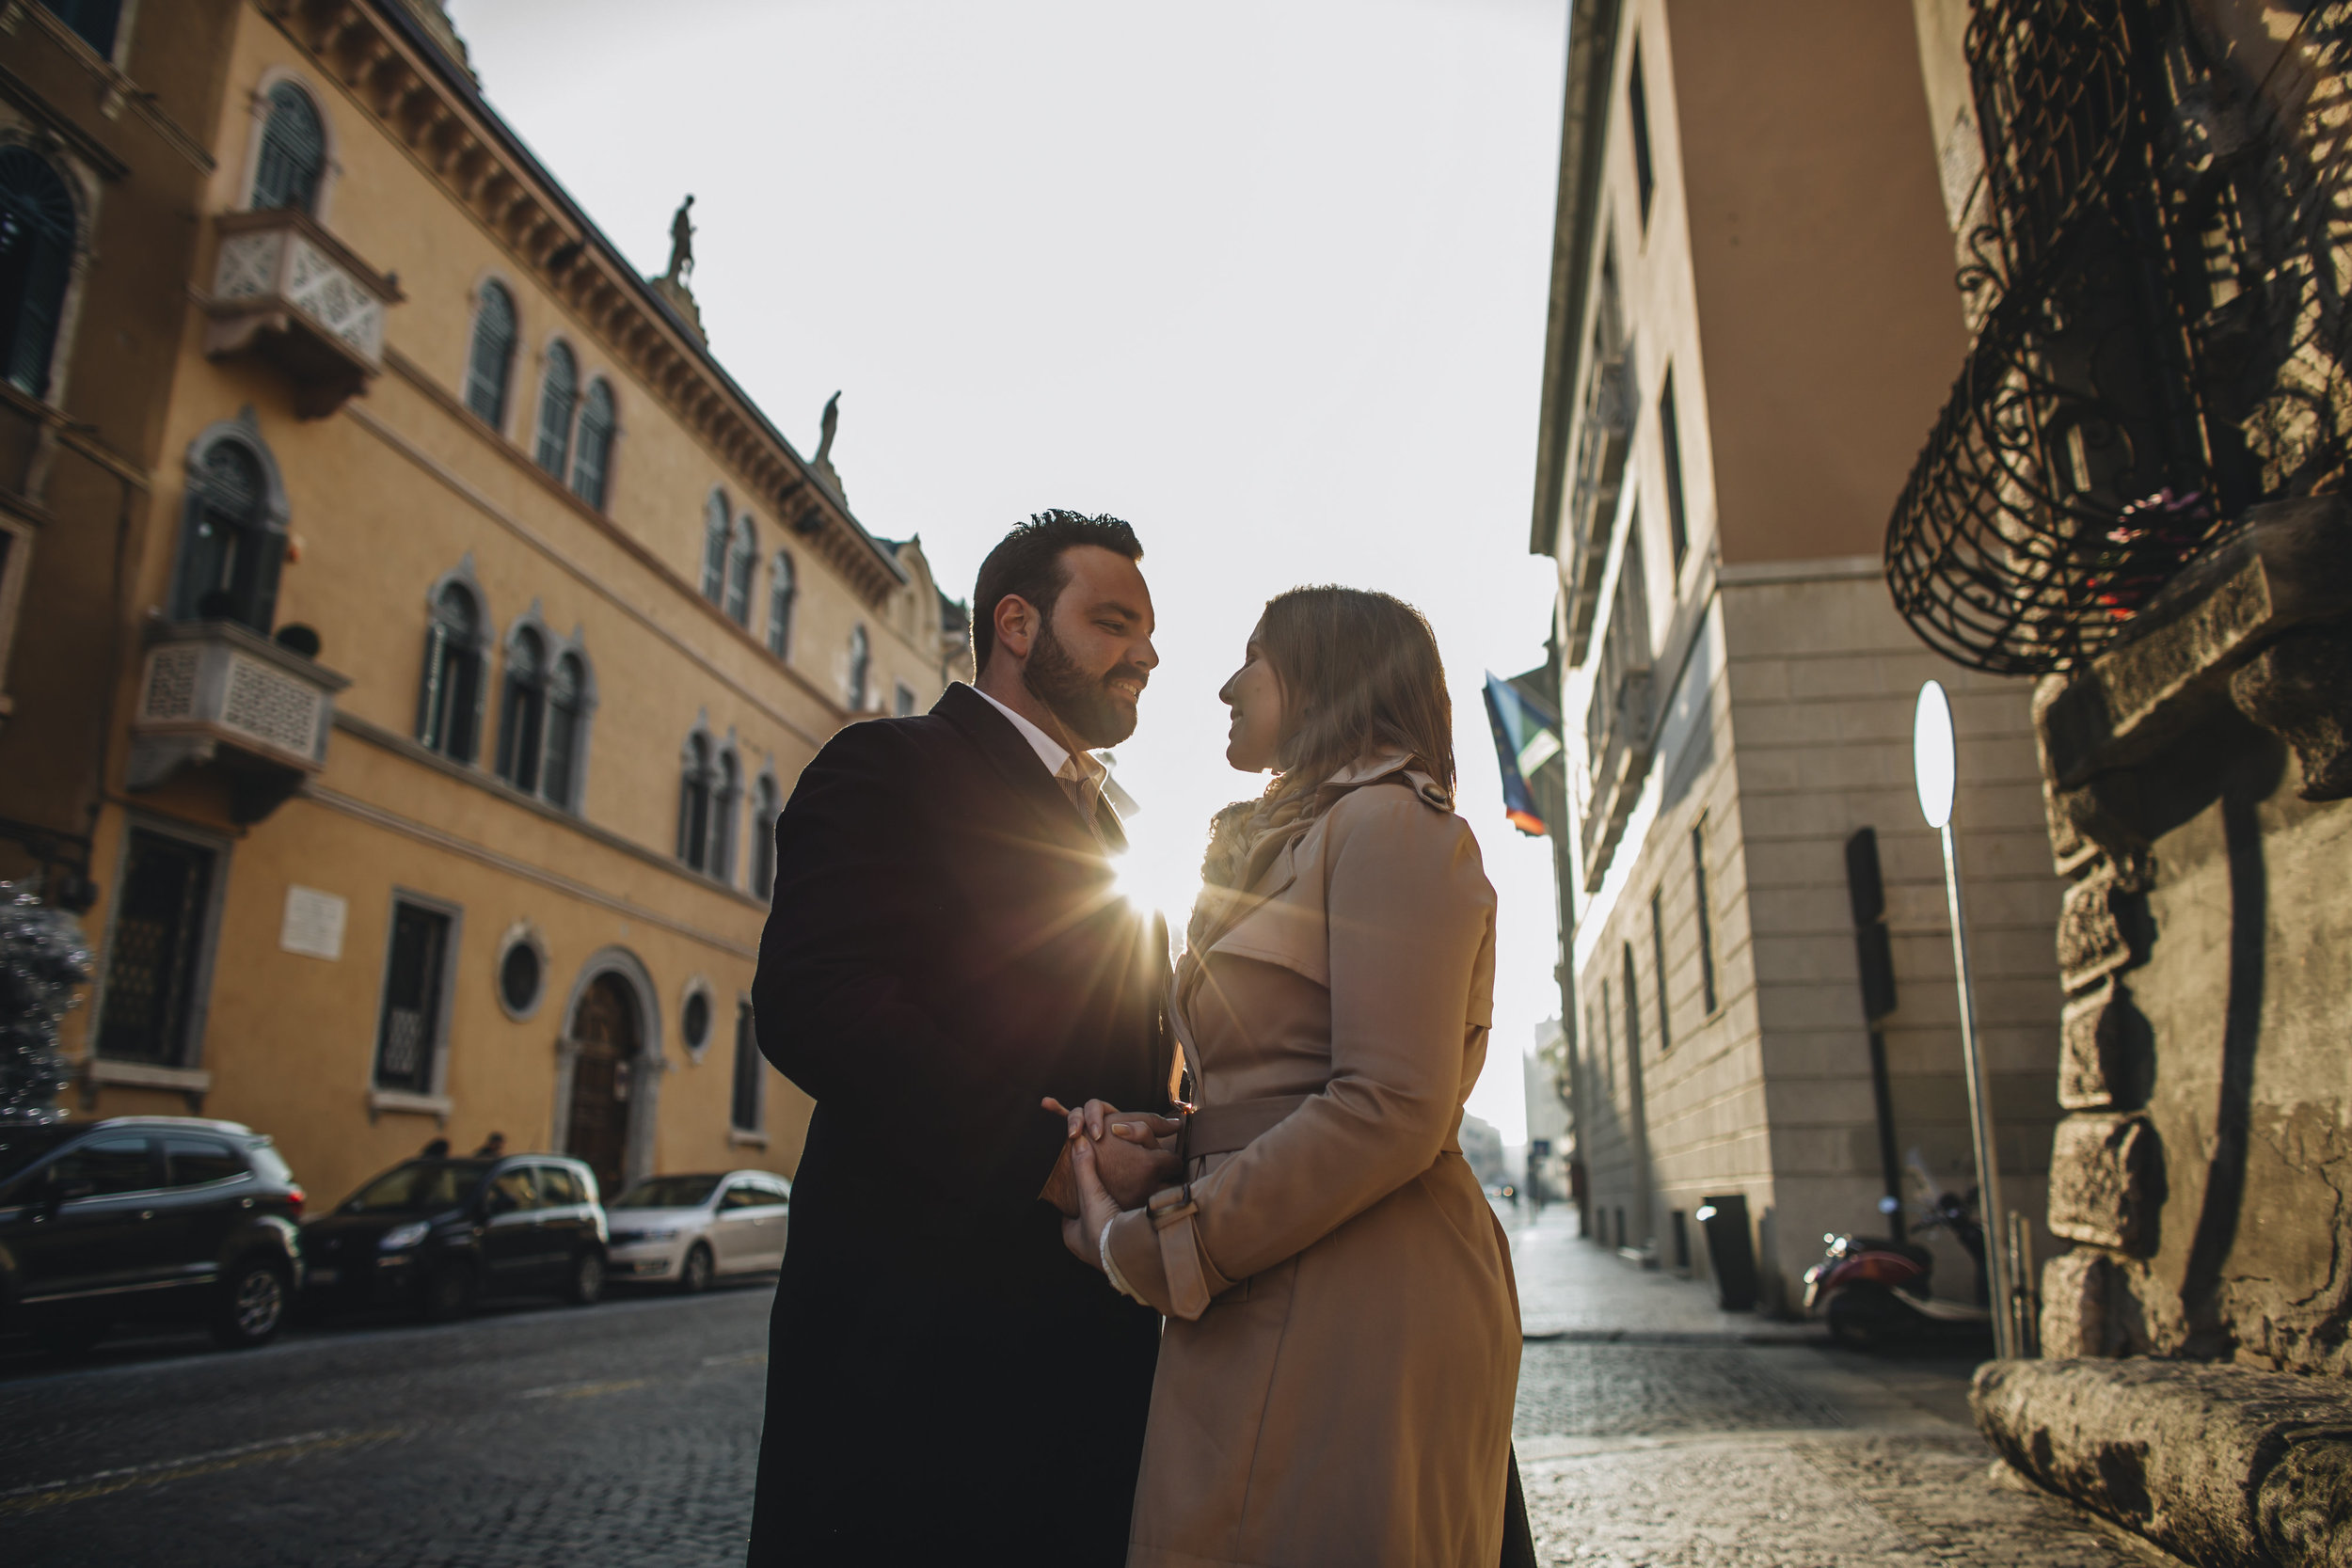 Gabi e Joao Italia Verona Marcela-Gabi e Joao Italia Verona Marcela-0030.jpg